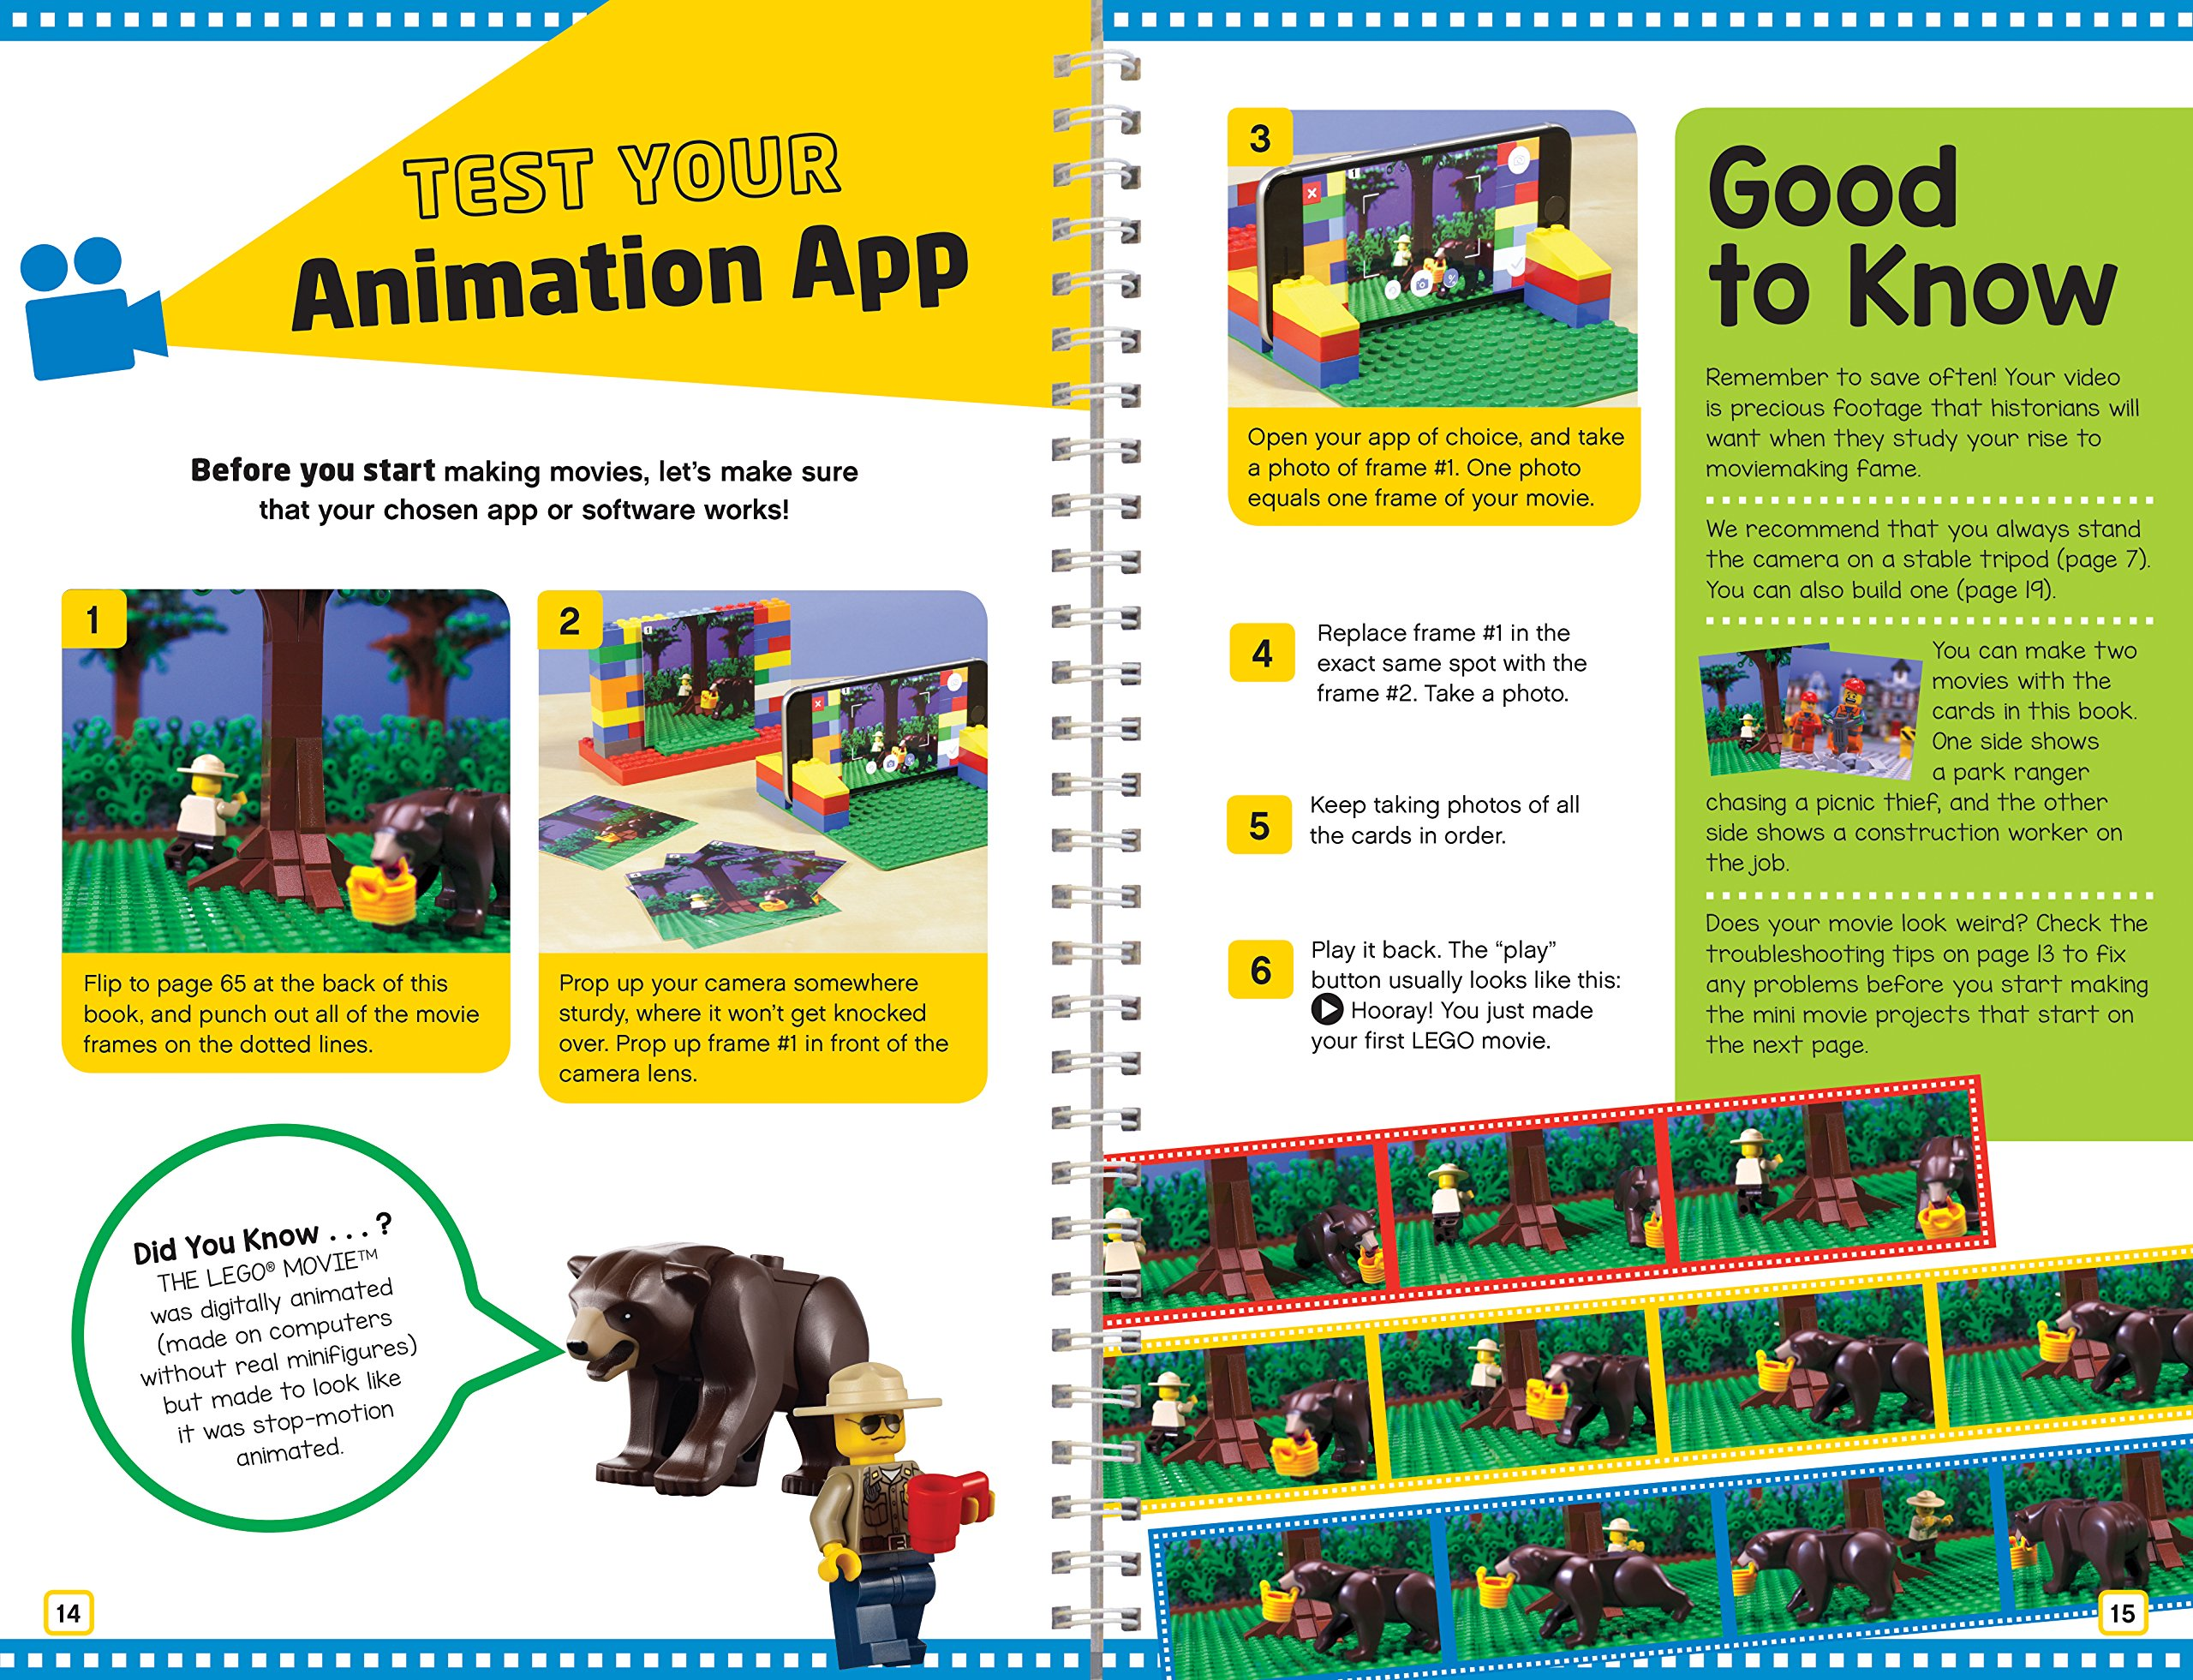 lego make your own movie klutz amazon co uk pat murphy books